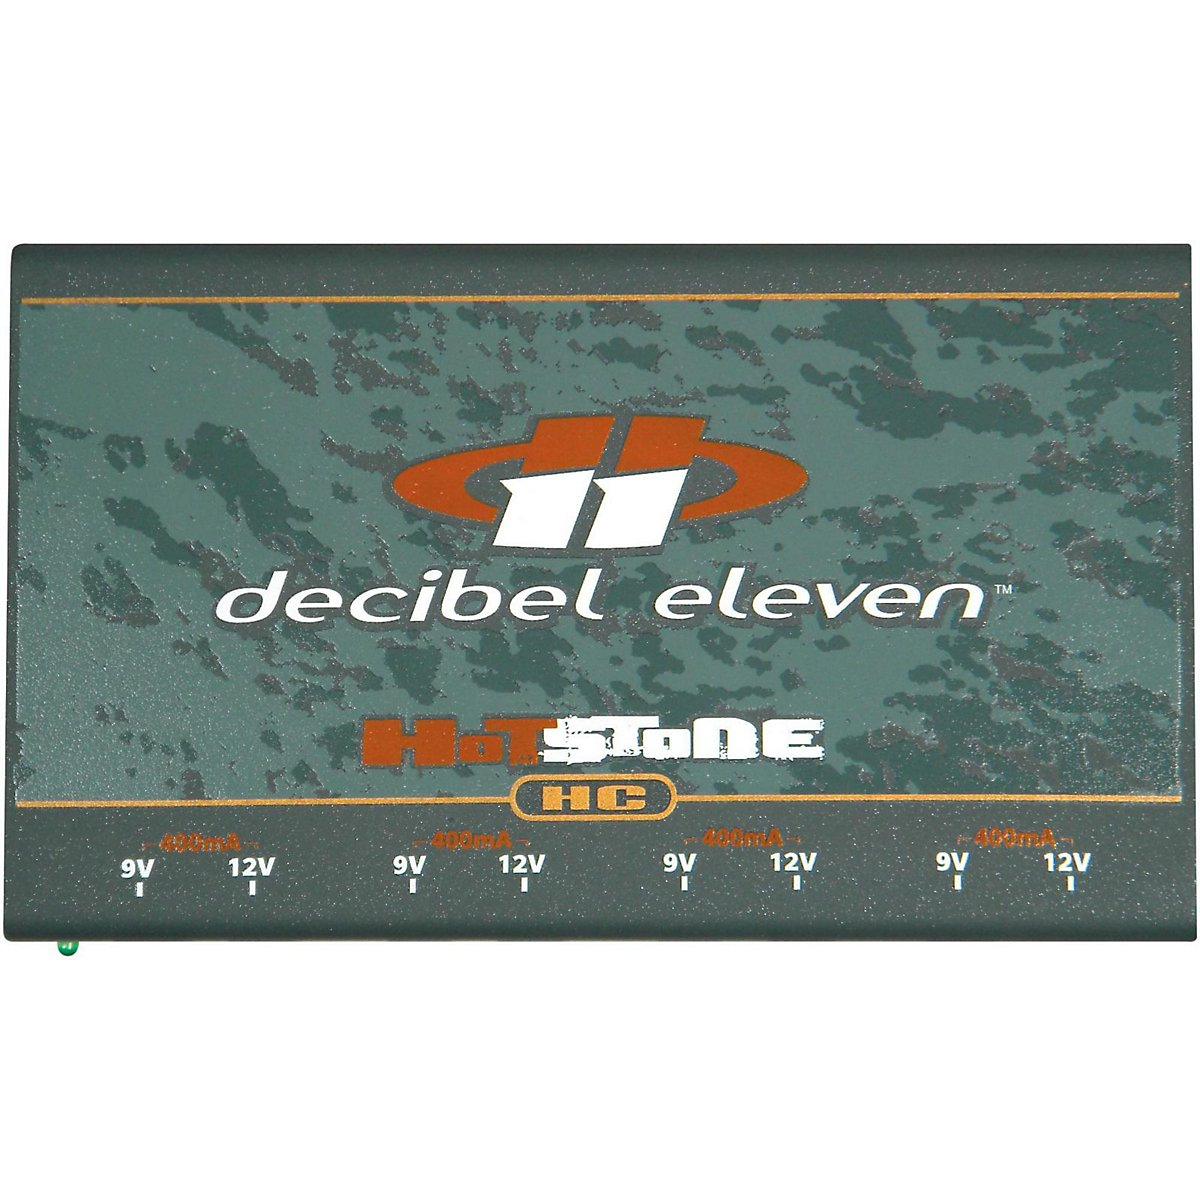 Decibel Eleven Hot Stone HC Isolated DC Power Supply by Decibel Eleven (Image #1)